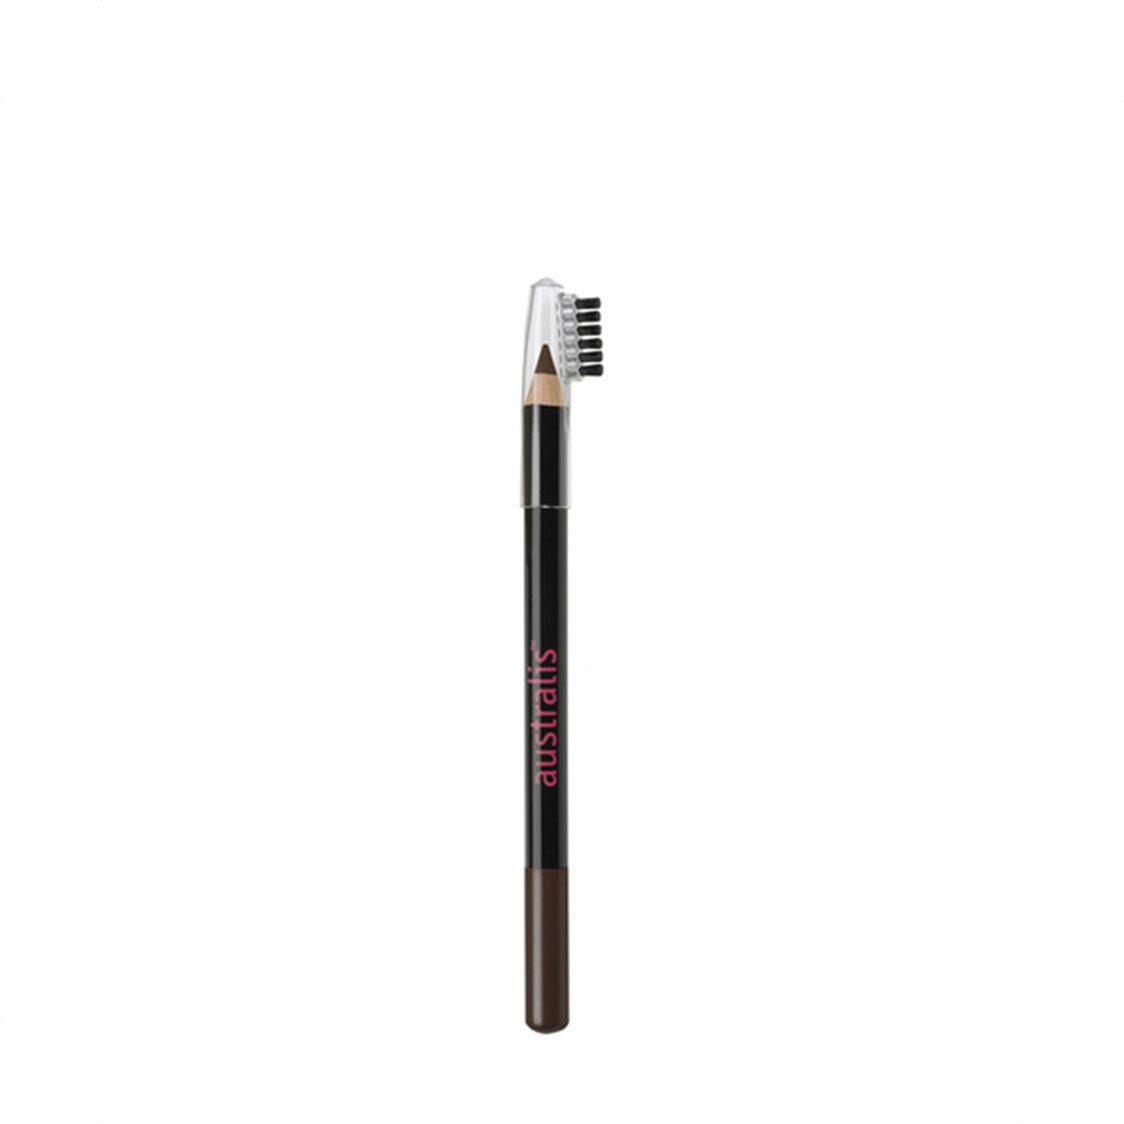 Australis Eyebrow Pencil - Dark Brown